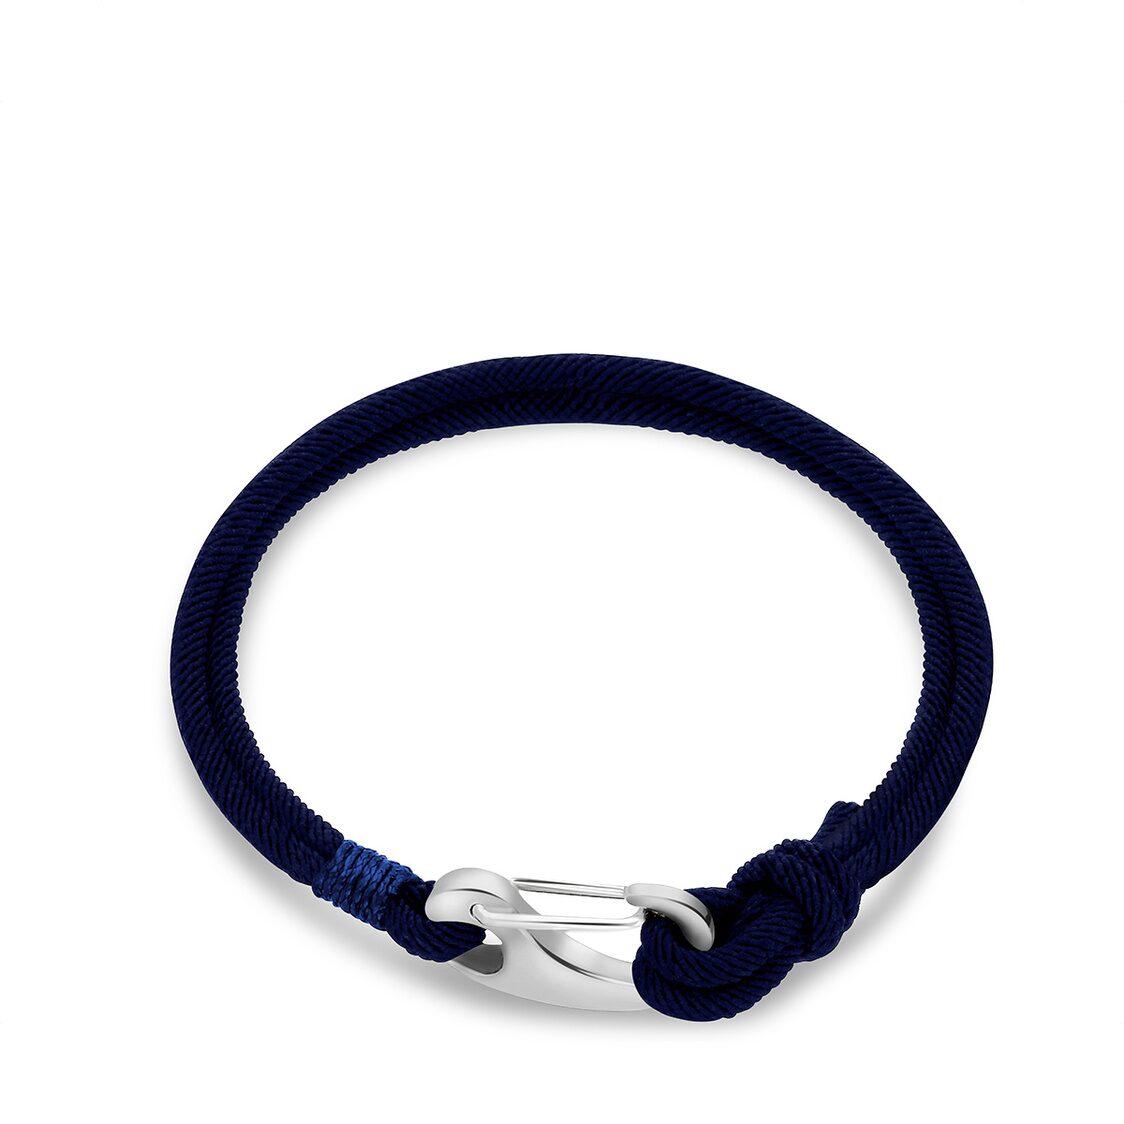 Ron Bracelet - Navy Rope